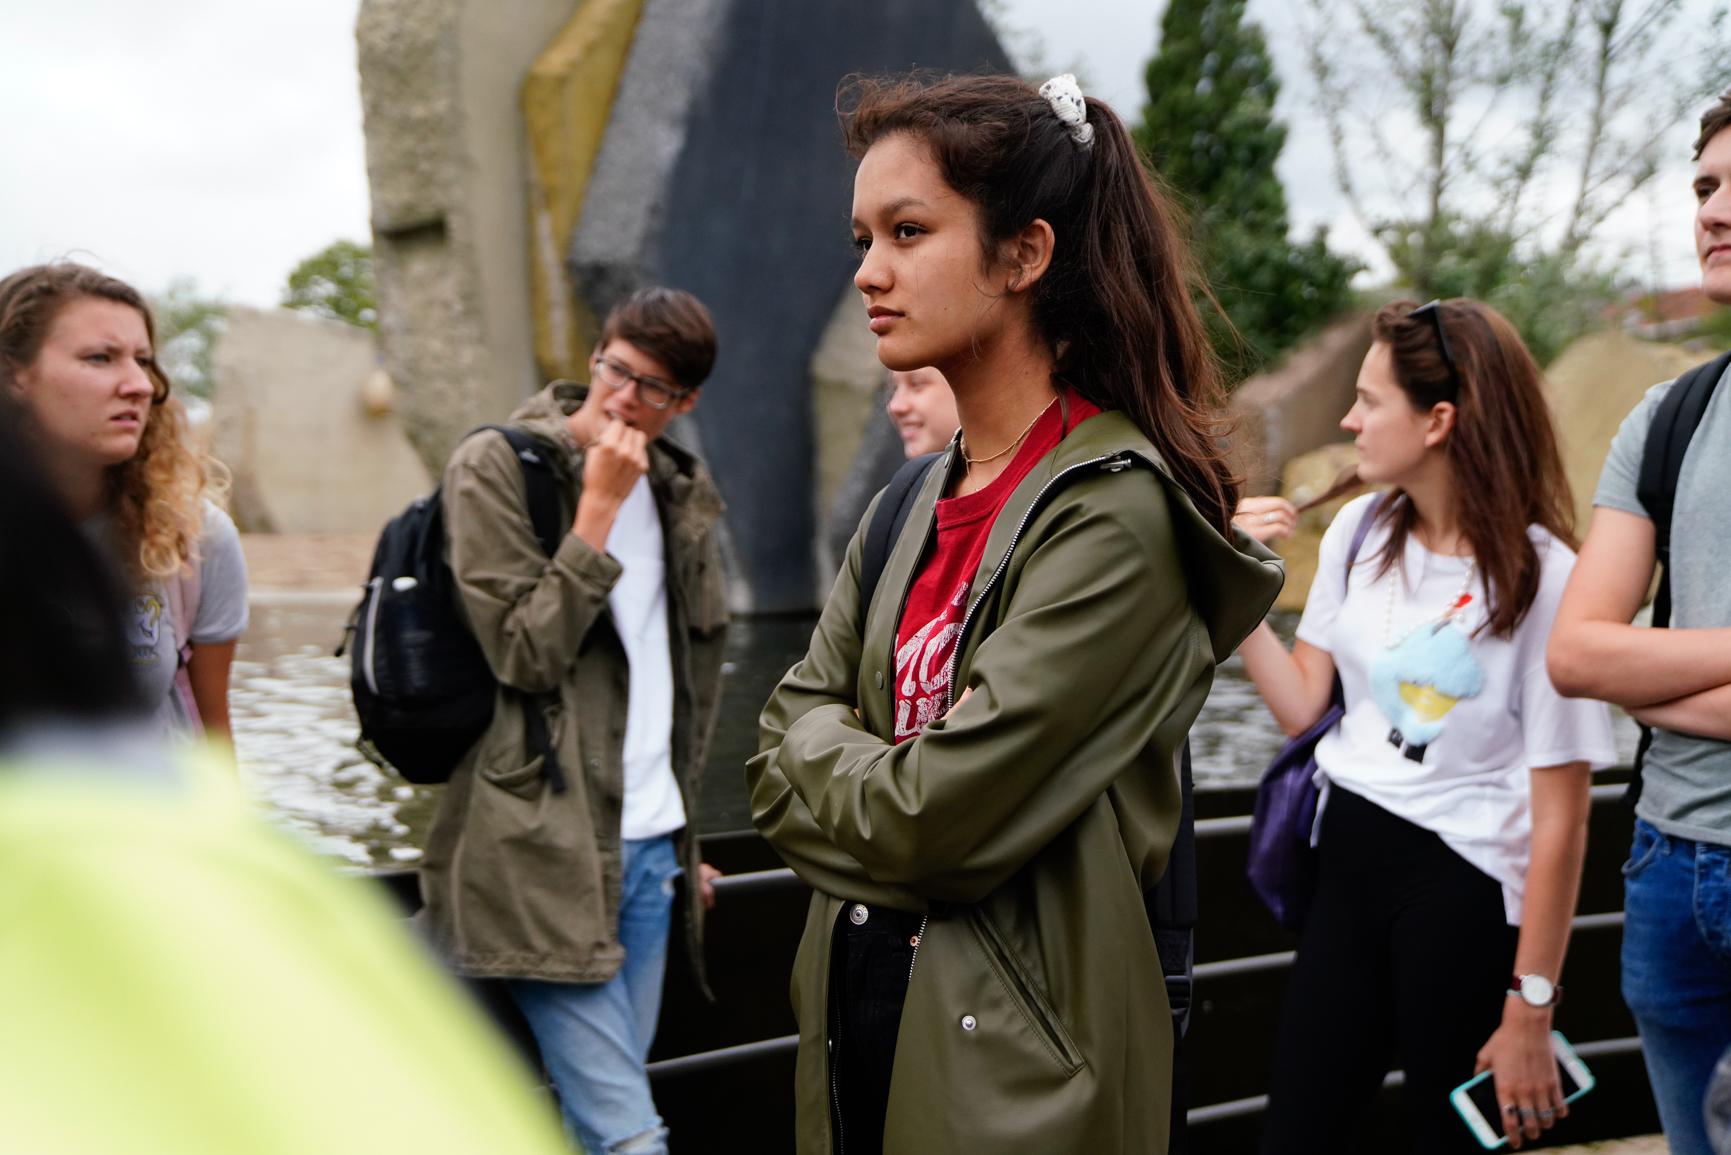 University of Amsterdam Summer School: International Relations